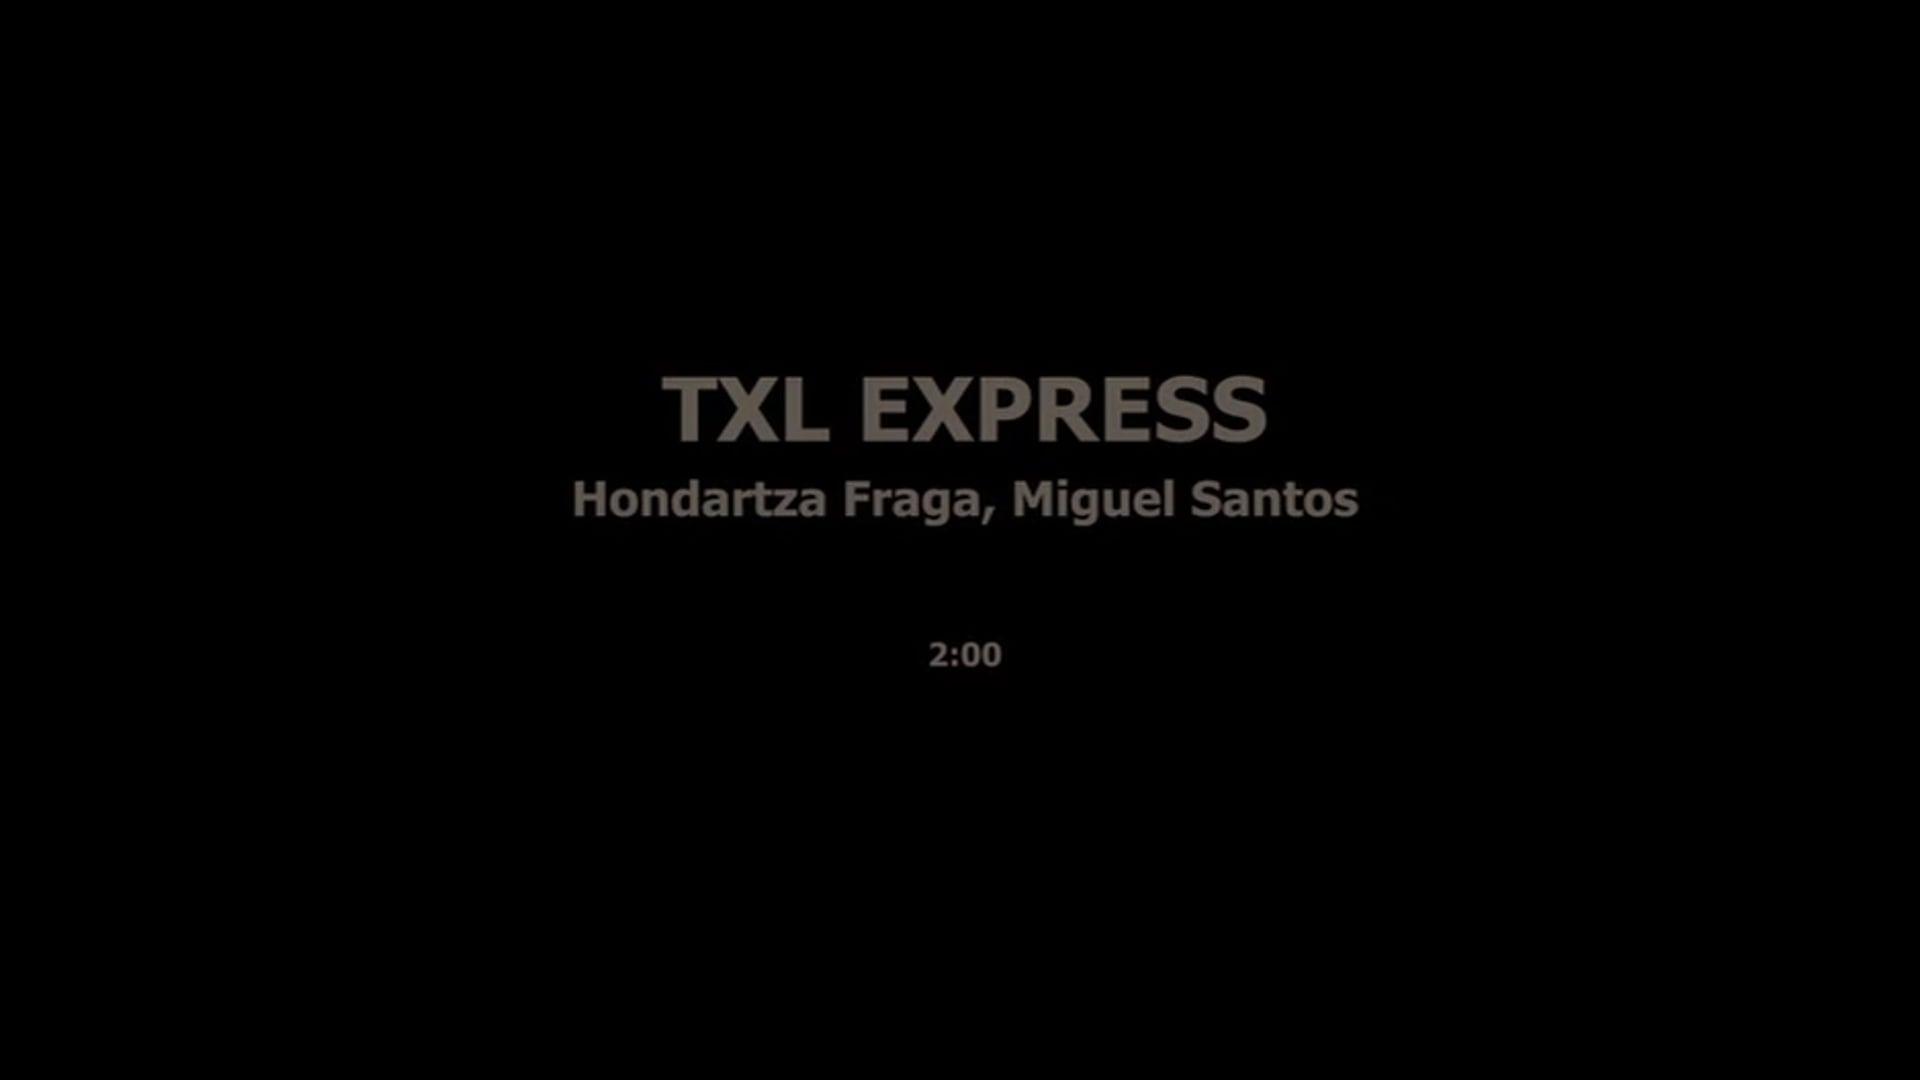 TXL EXPRESS - HONDARTZA FRAGA, MIGUEL SANTOS